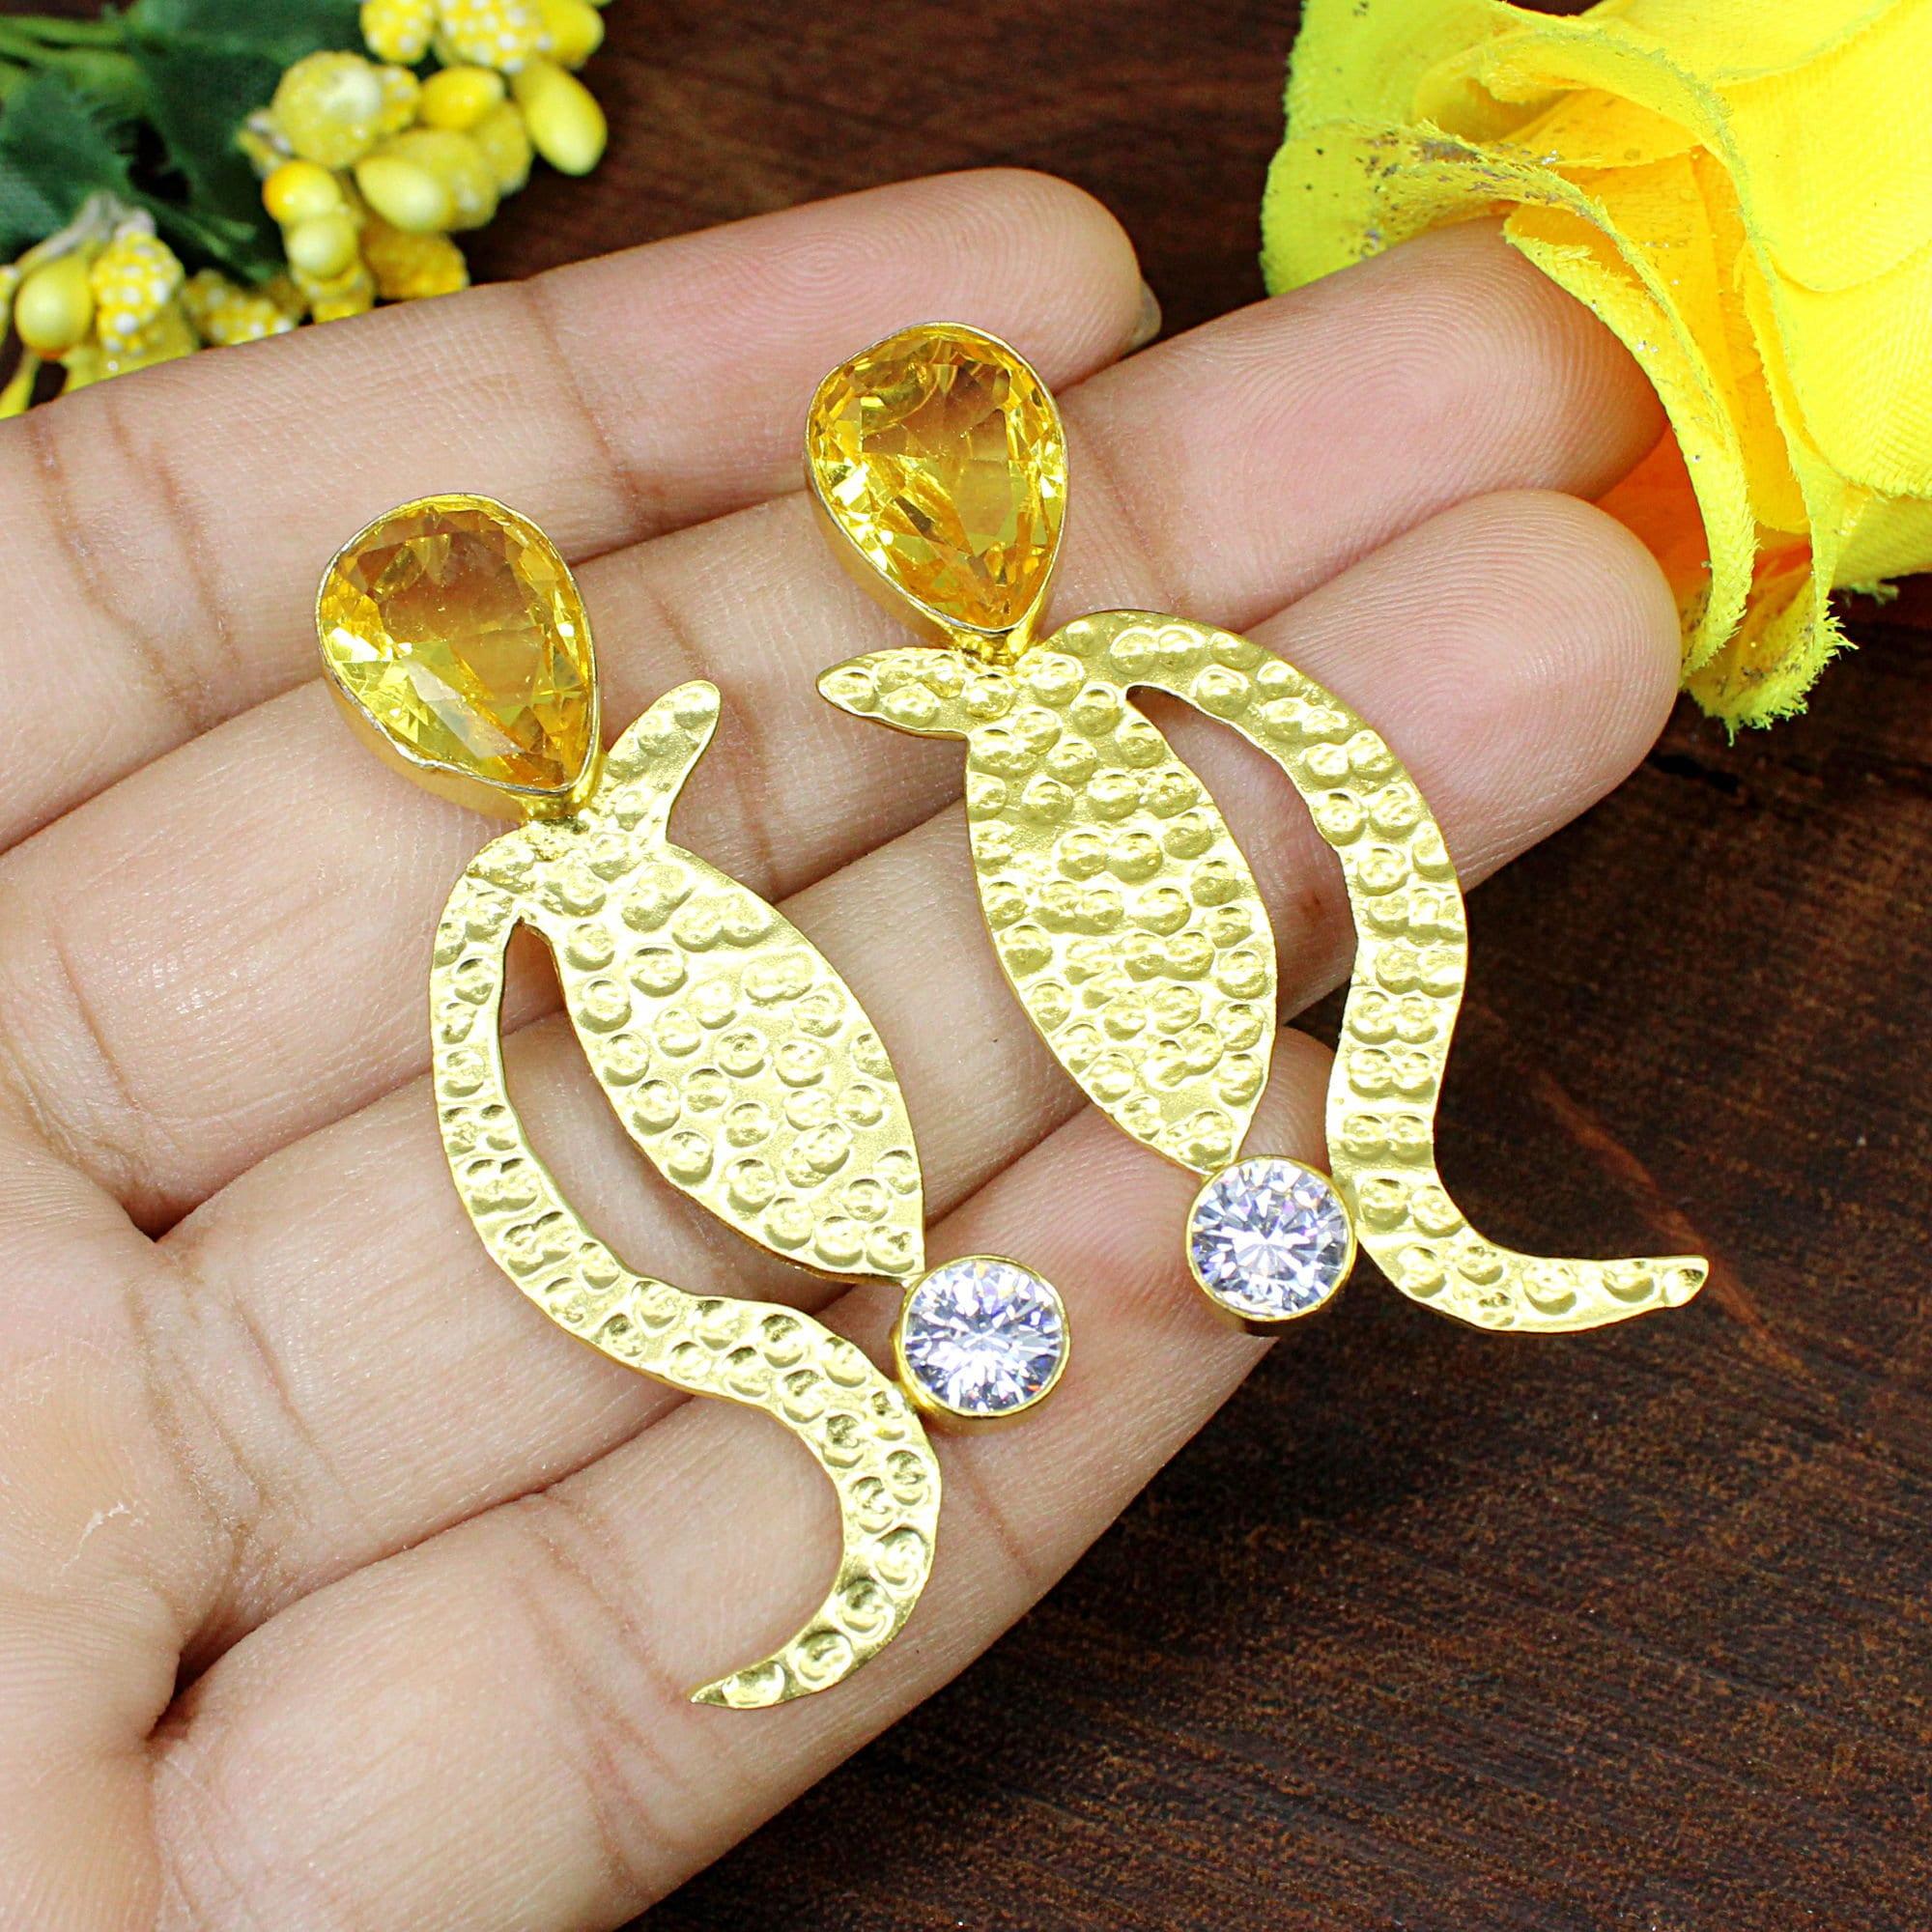 14K Gold Plated Lightweight Long Earrings Mother of Pearl Dangle /& Drop Citrine Earrings Wedding Earrings Gift for Her